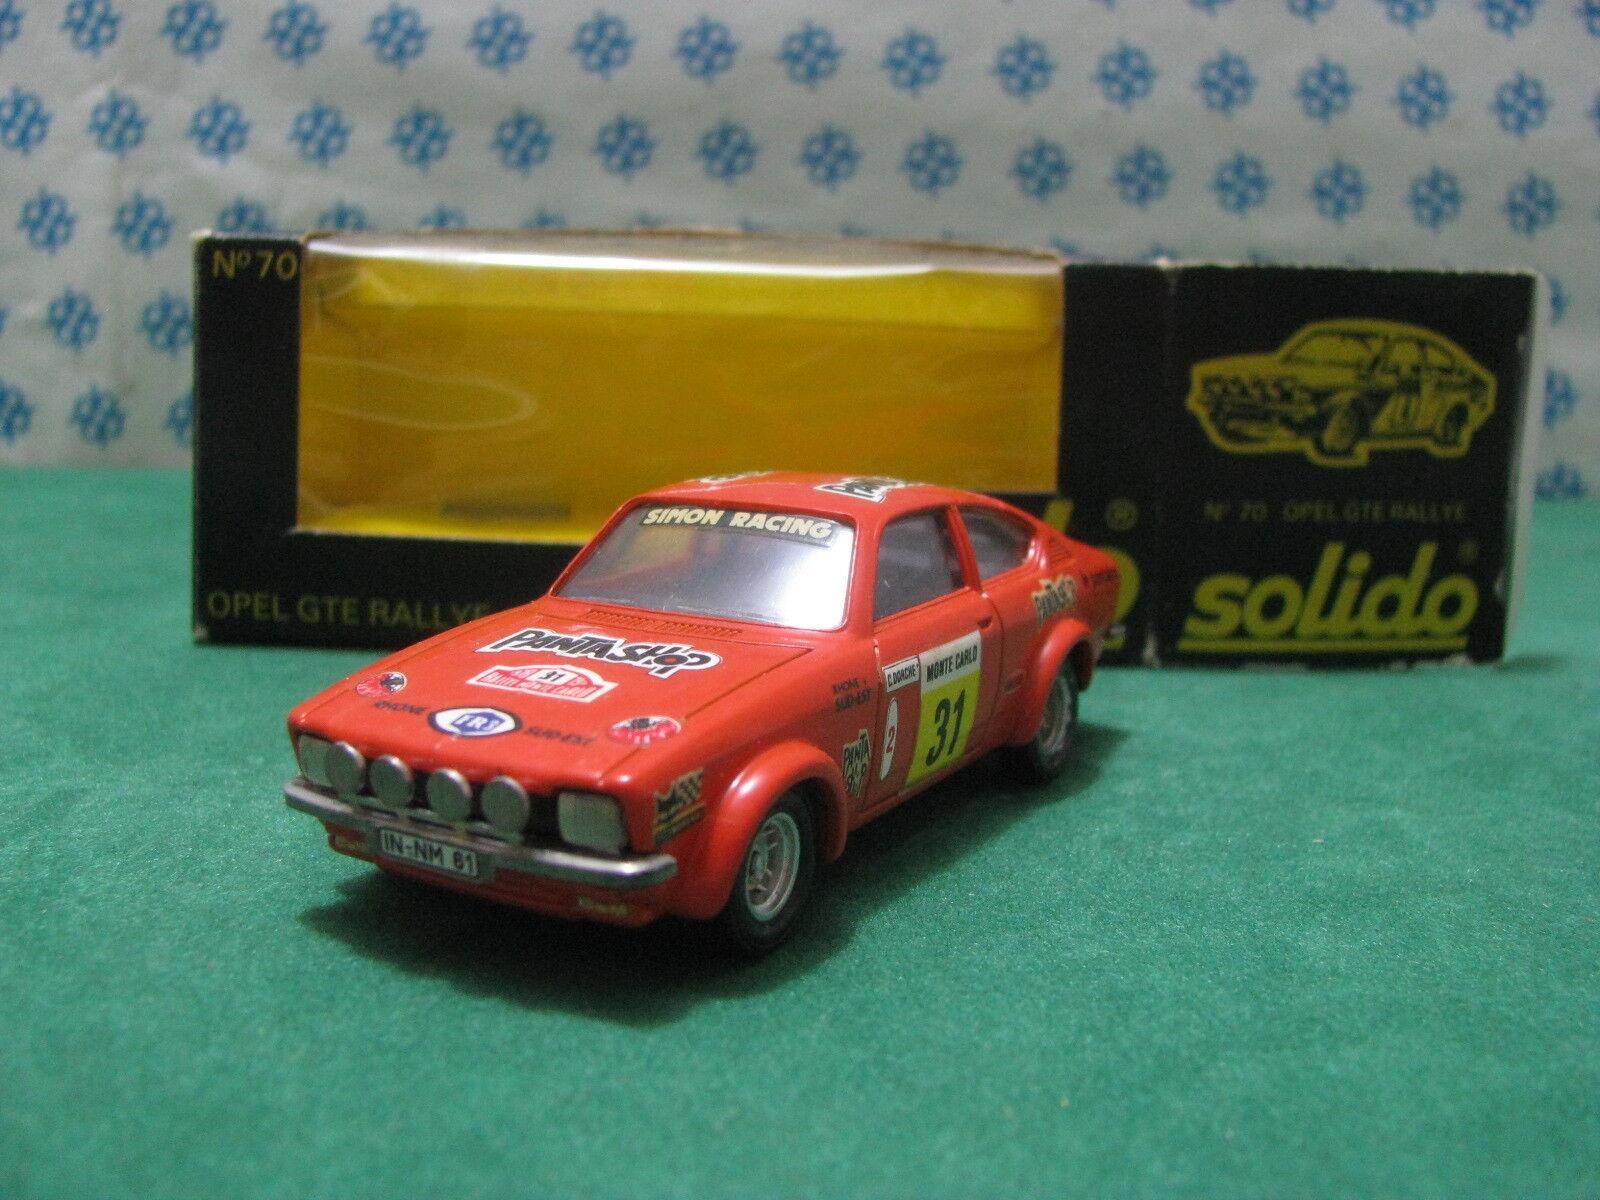 Vintage - OPEL GTE 2700cc. coupè  Rally Montecarlo    - 1 43 Solido n°70